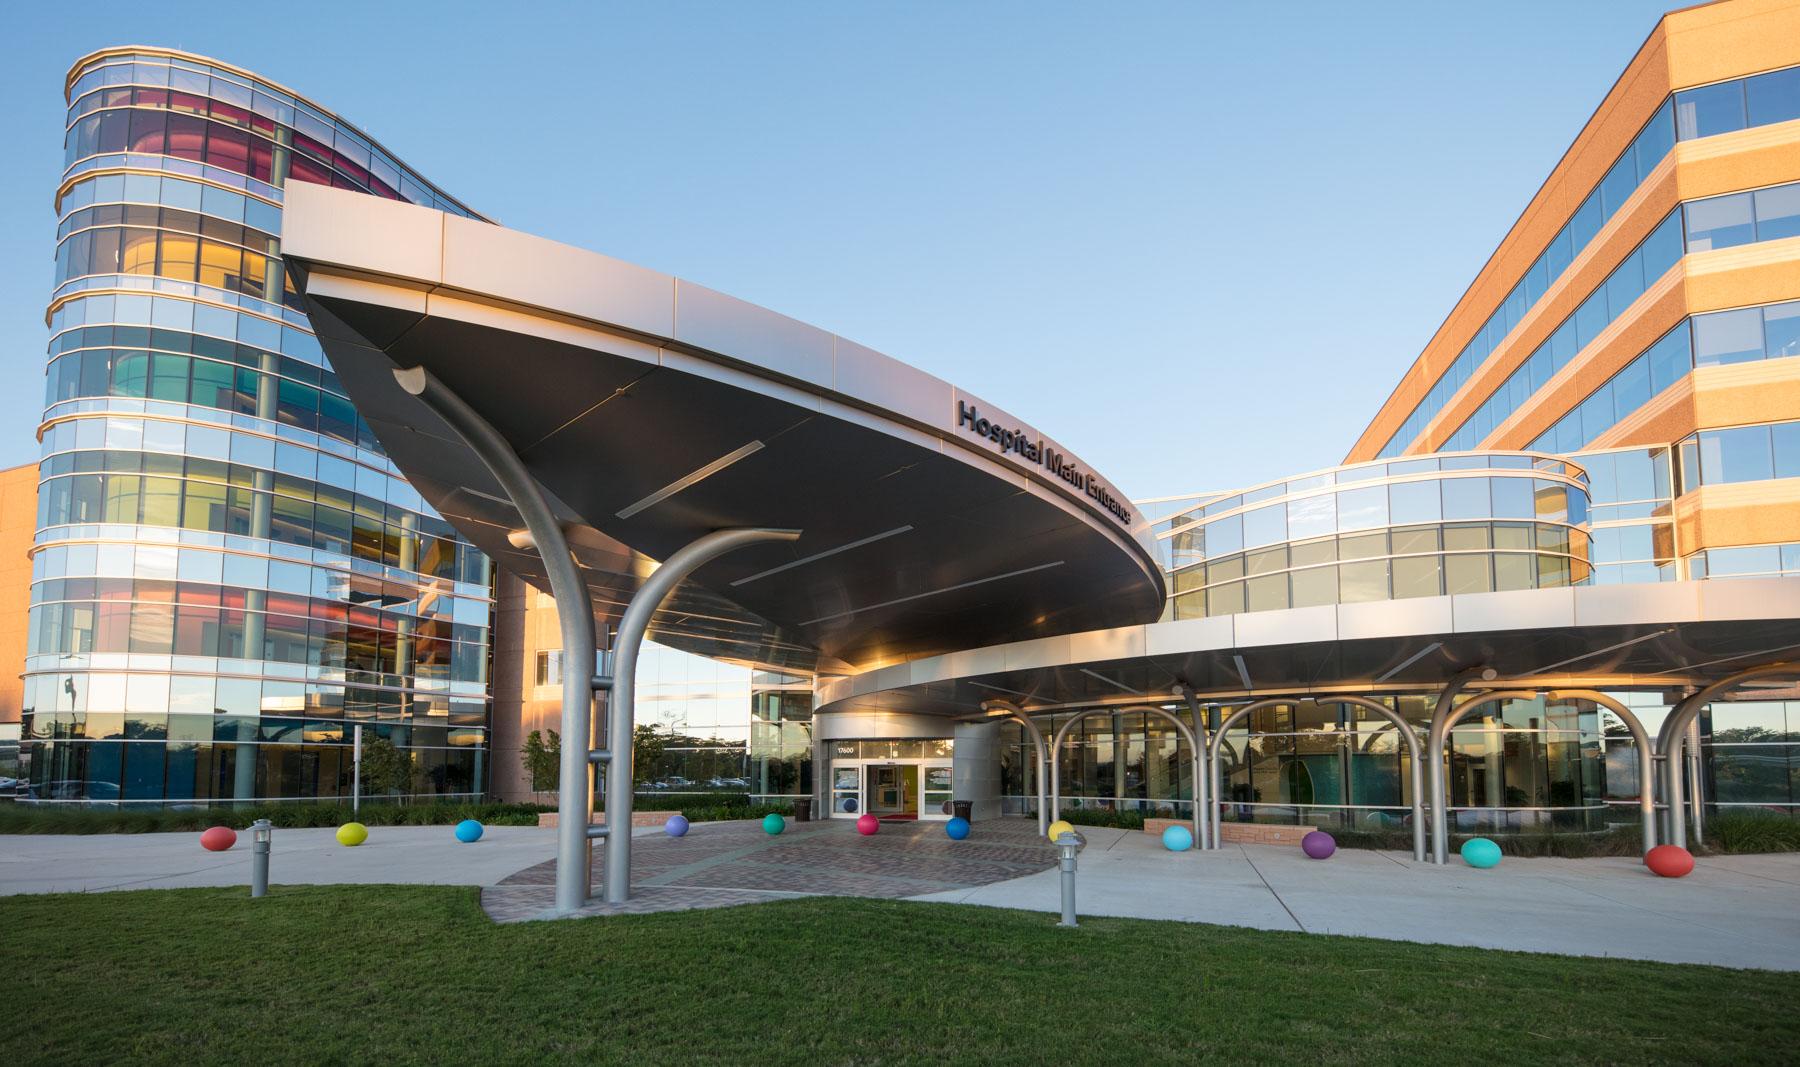 Texas Childrens Hospital The Woodlands Celebrates Spirit of Design